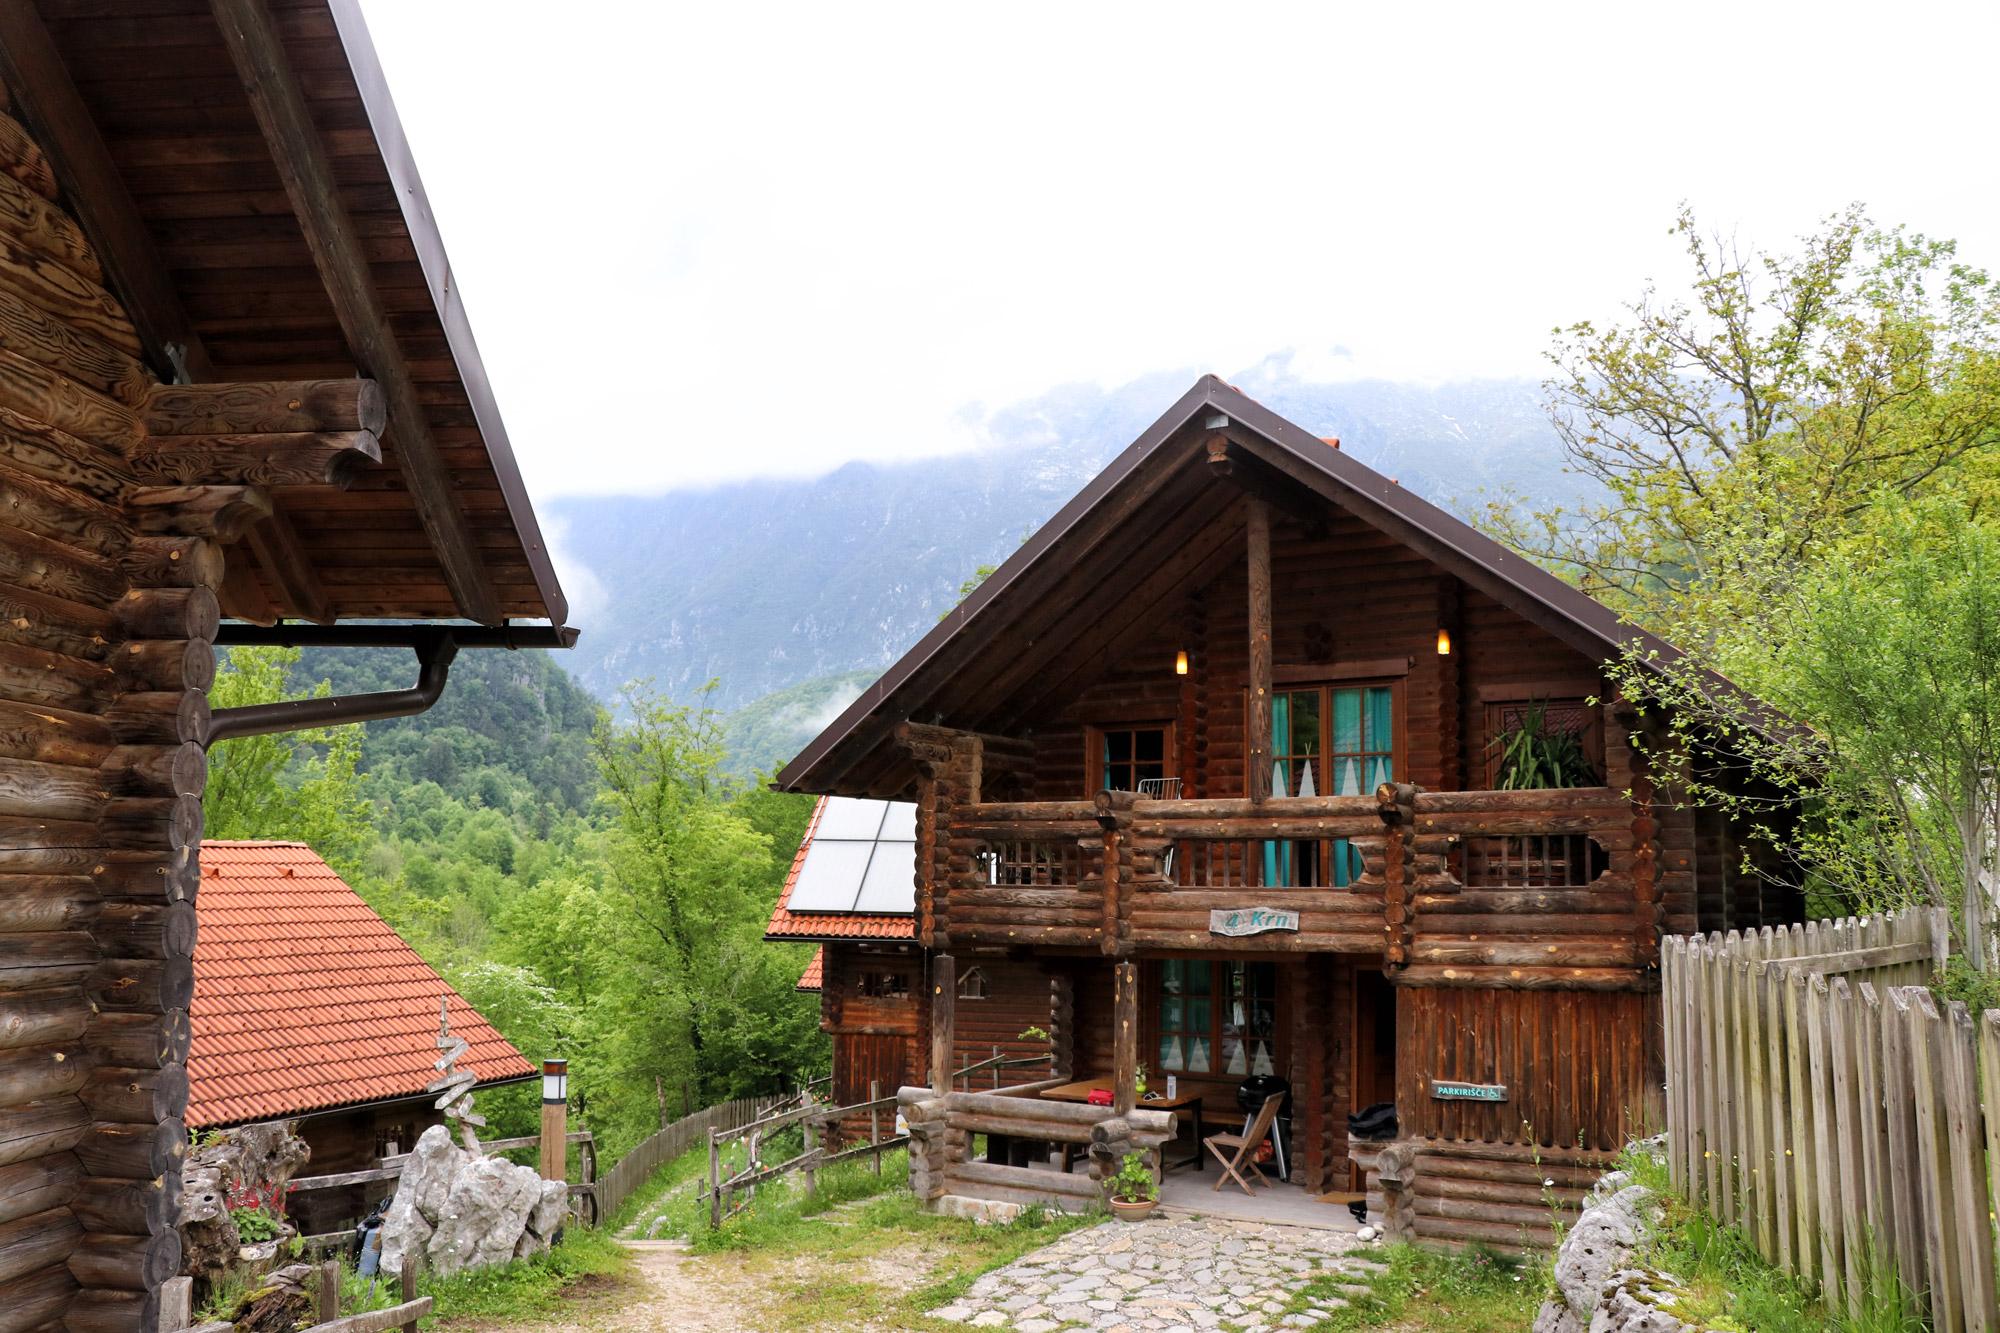 Soška pot wandeling in Slovenië - Kamp Koren